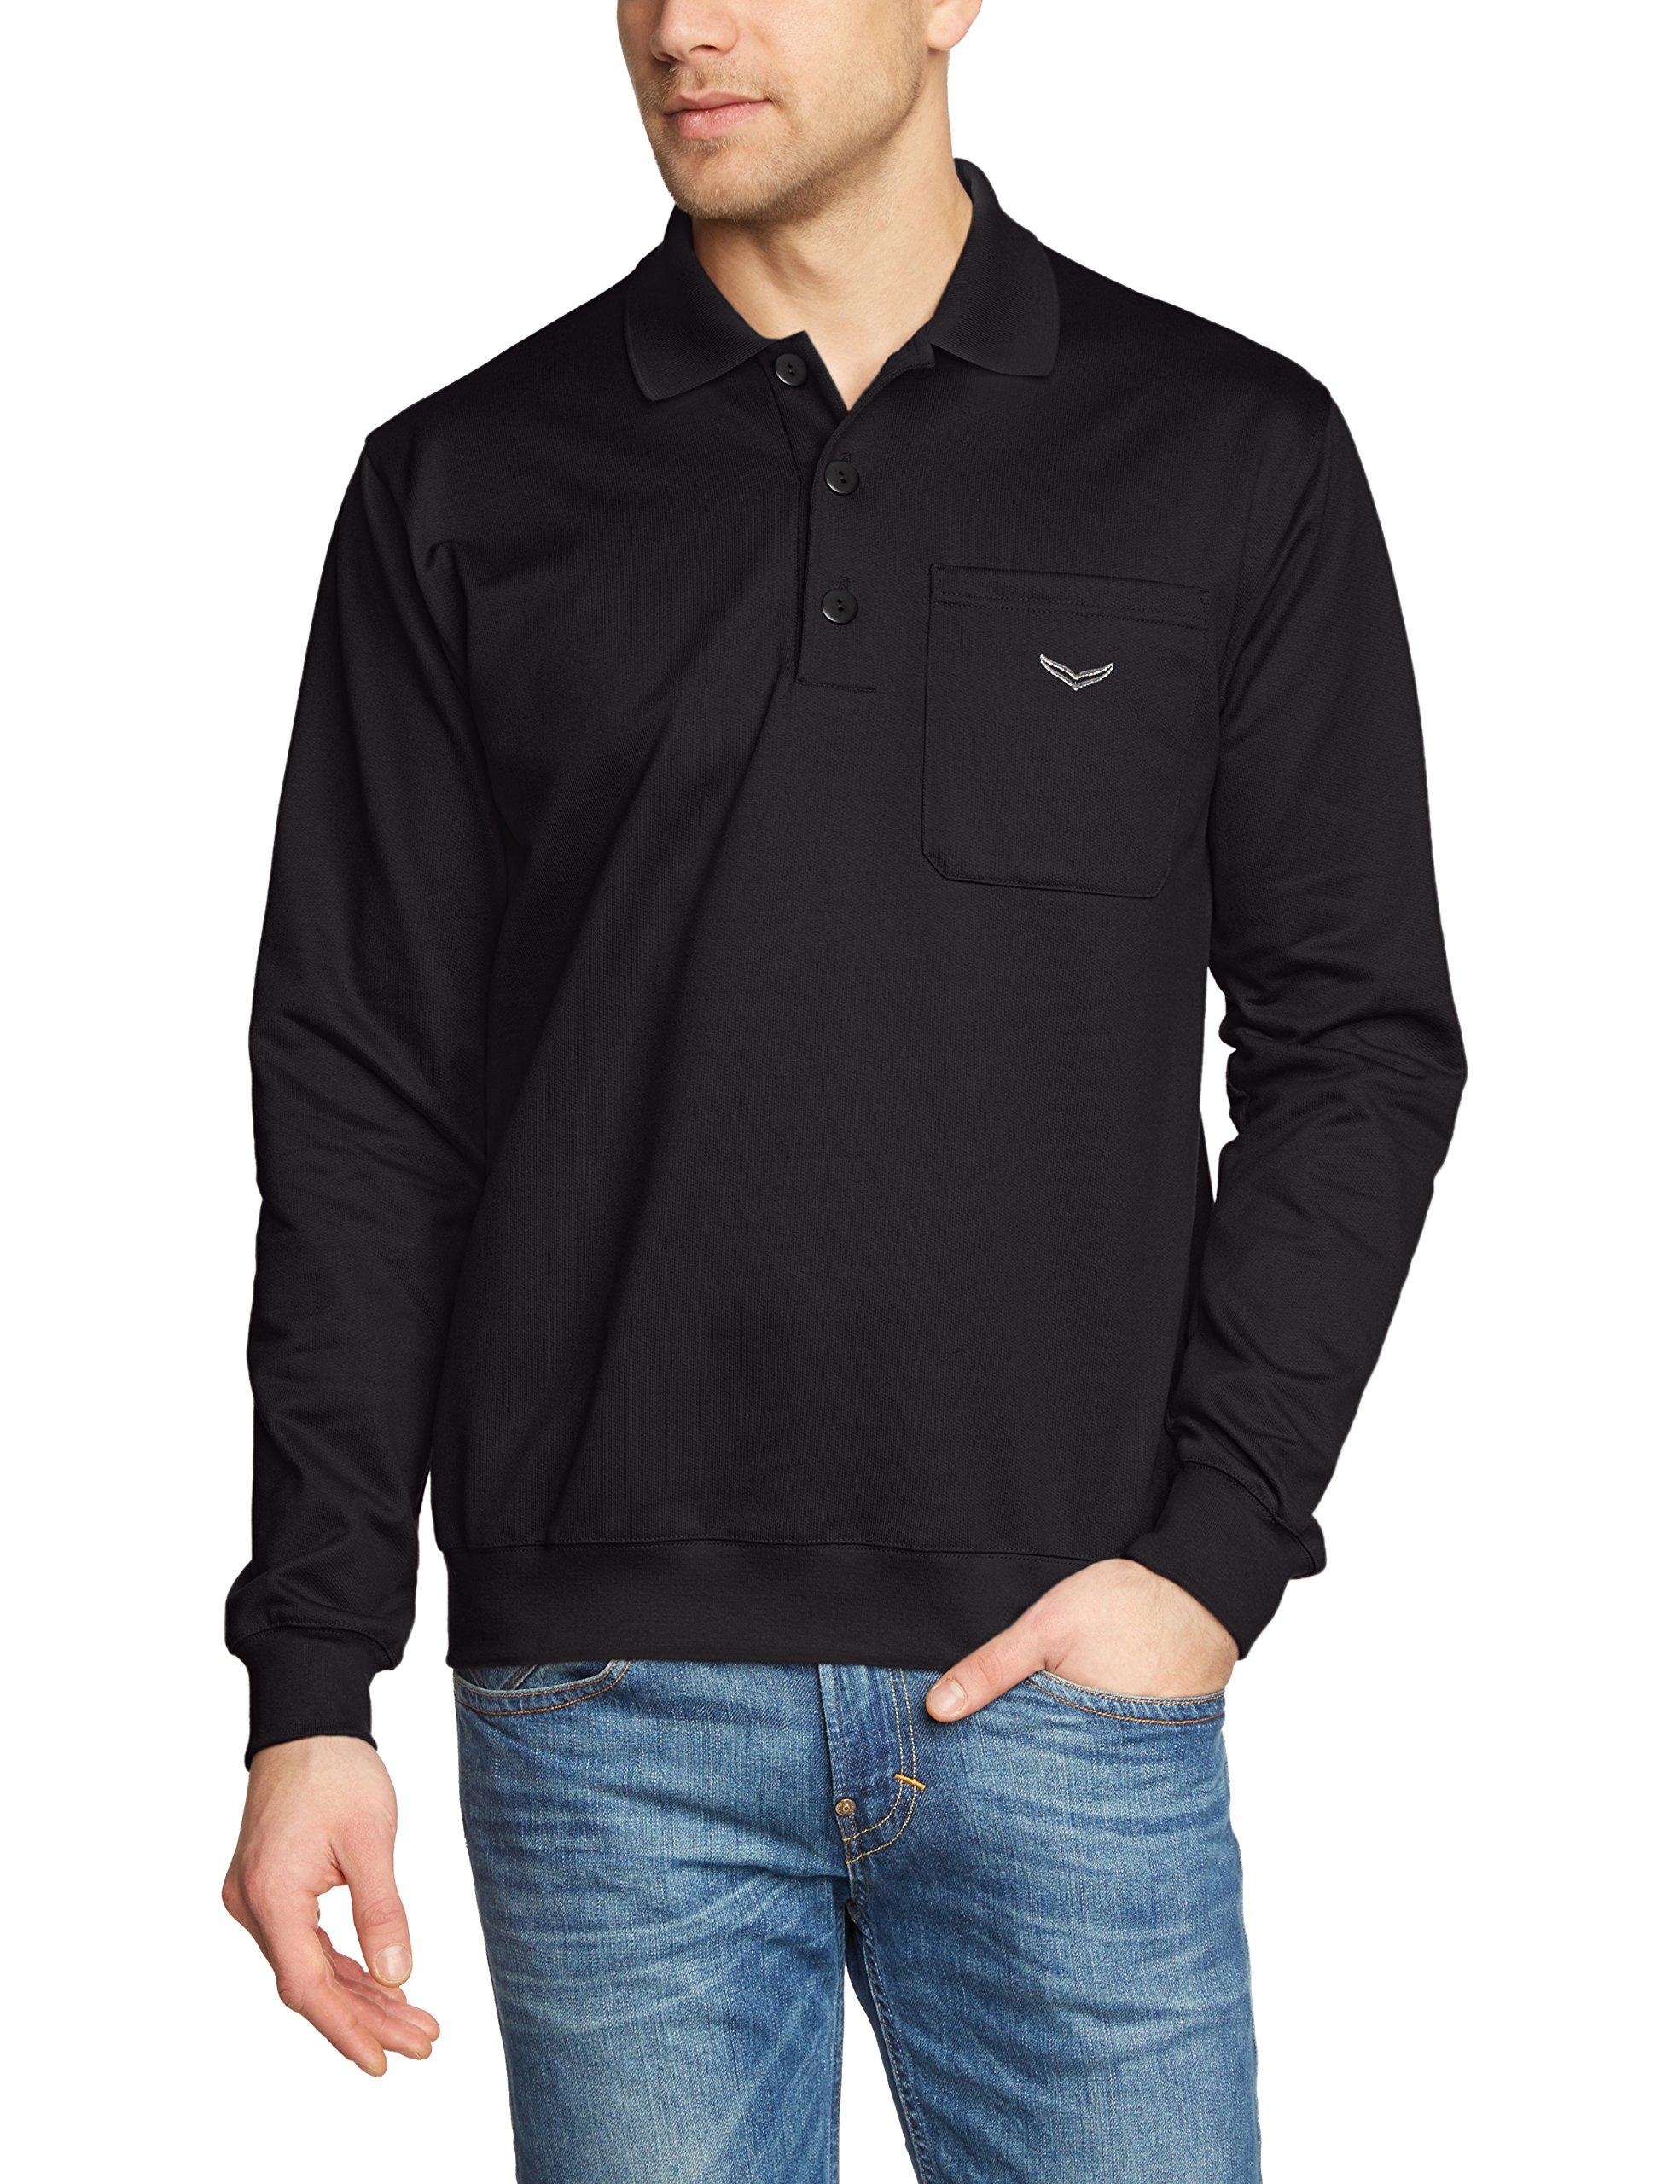 Trigema 008M Sweat Homme shirtschwarz 674602 6yYgf7b